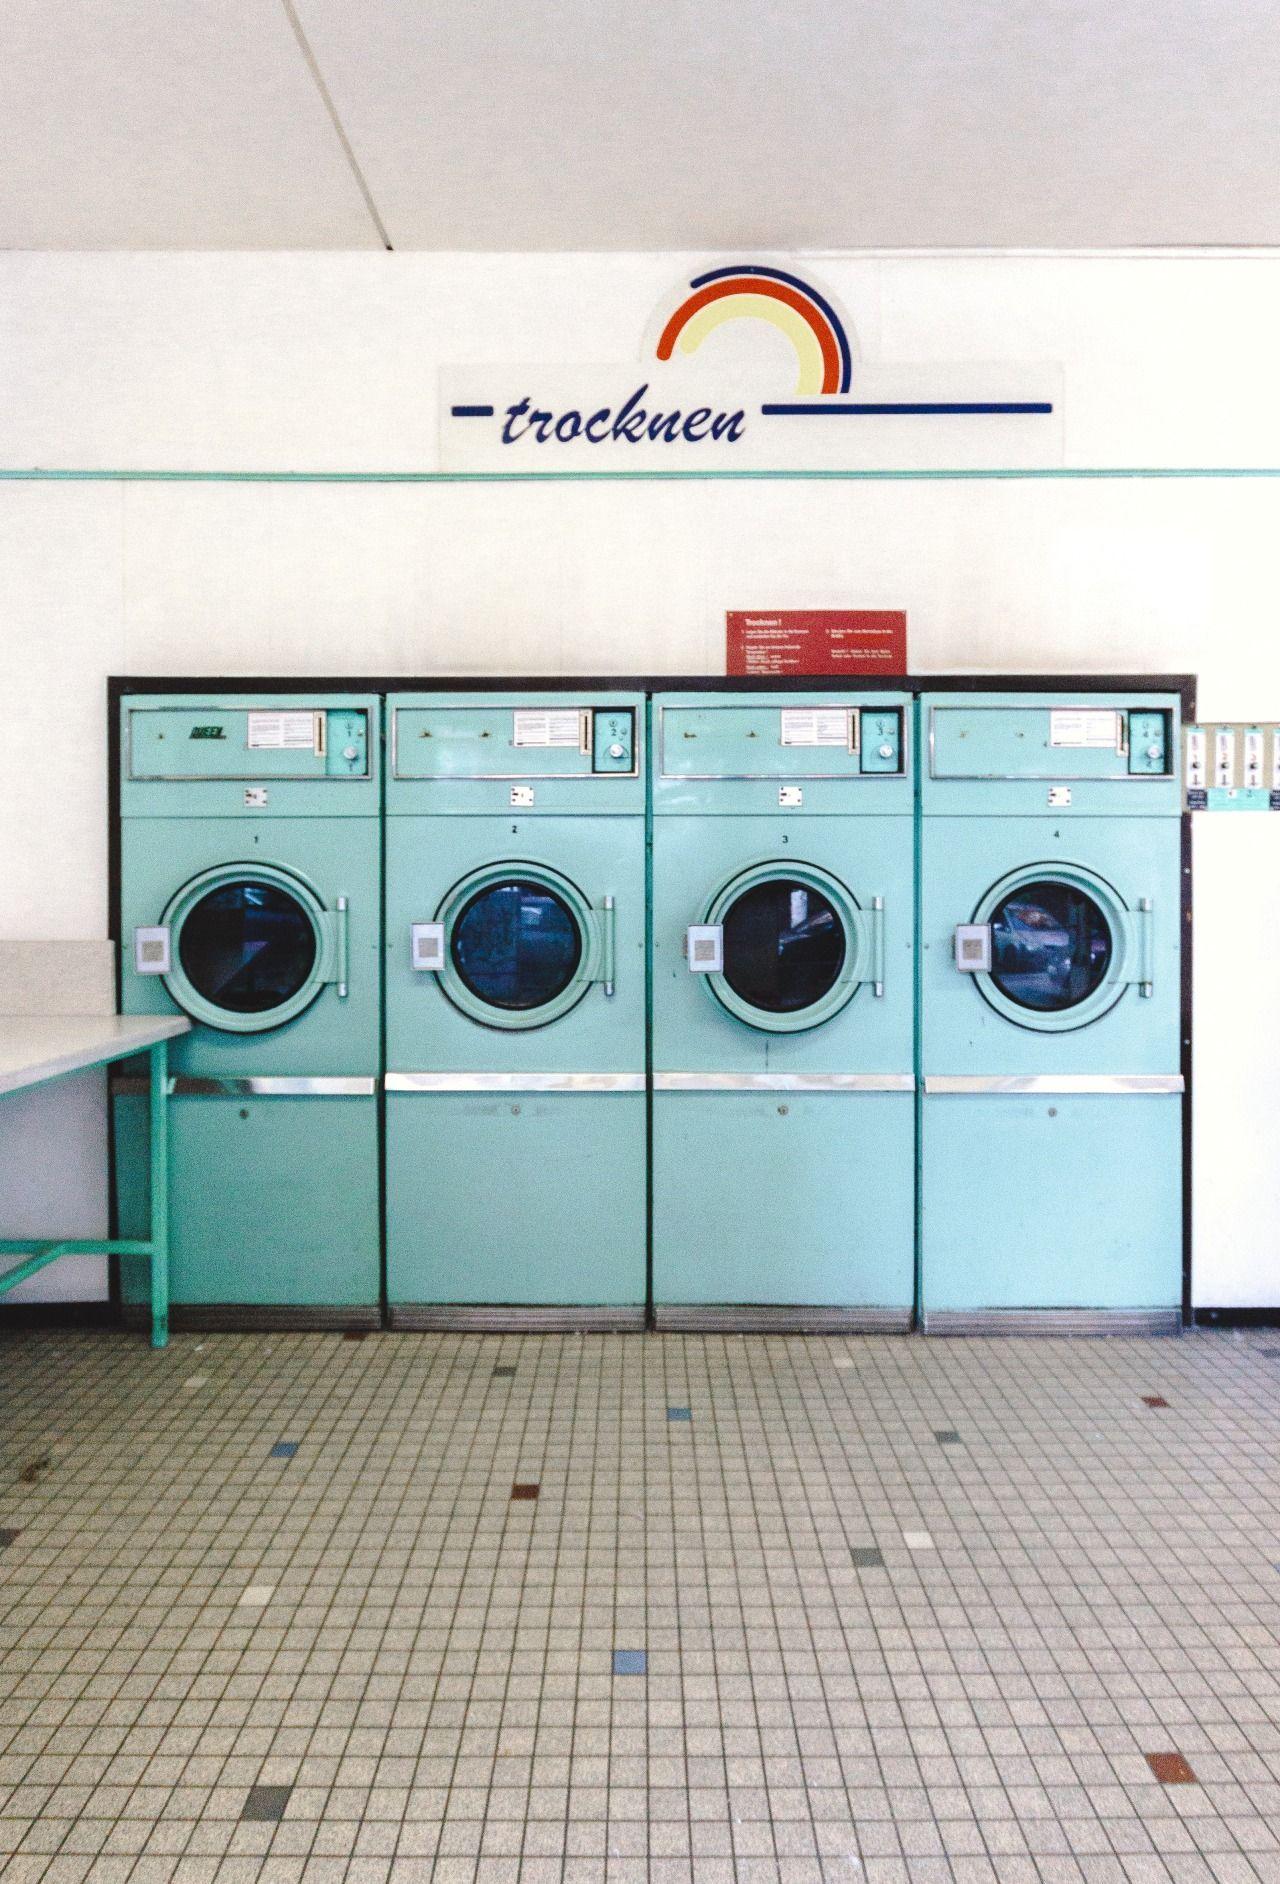 Trocknena Very Retro Laundromat Wascherei Near Our Apartment